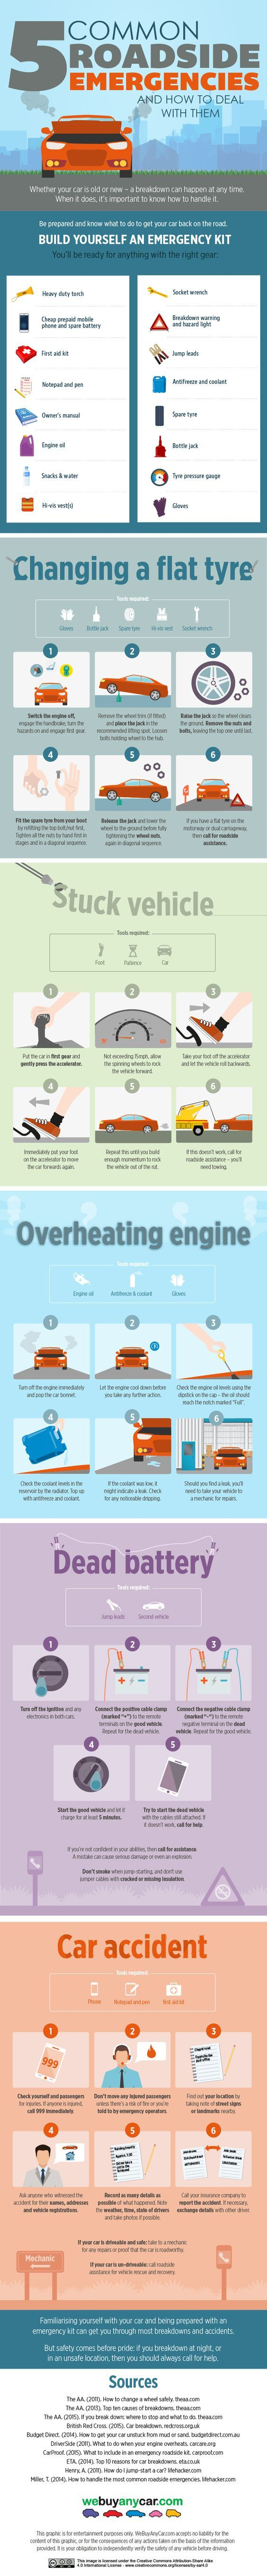 #Motorcars #Lansing #UsedCars #GreatDeals #Finance #UsedTrucks